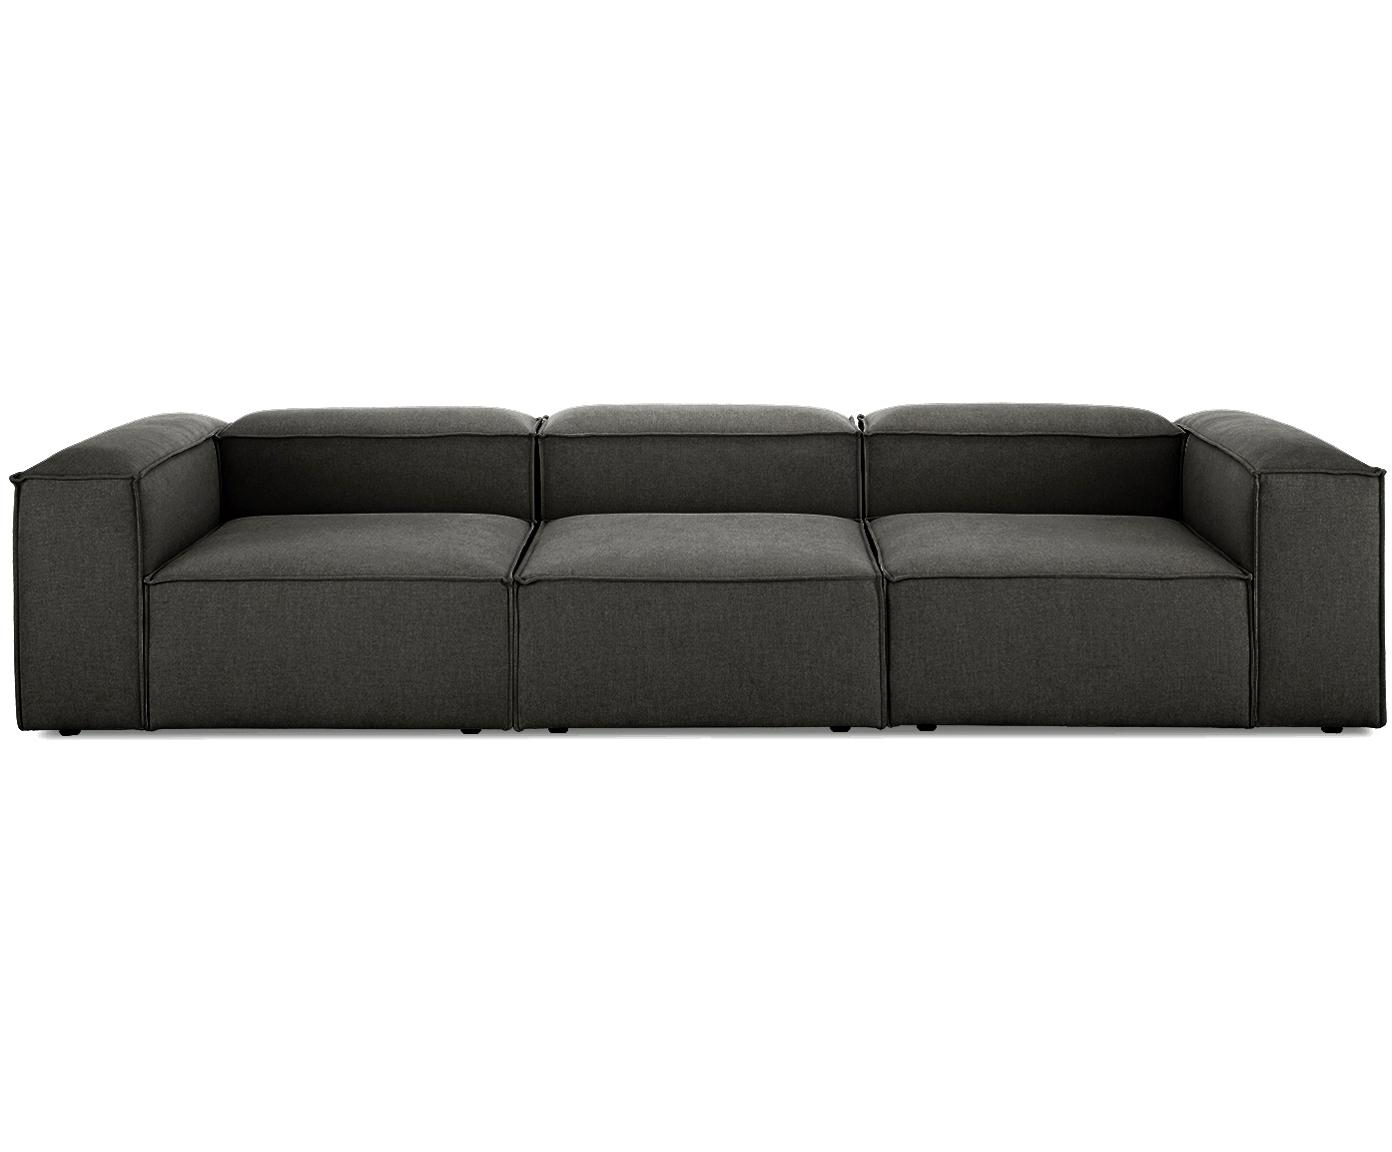 Modulares Sofa Lennon (4-Sitzer), Bezug: Polyester 35.000 Scheuert, Gestell: Massives Kiefernholz, Spe, Webstoff Anthrazit, B 326 x T 119 cm